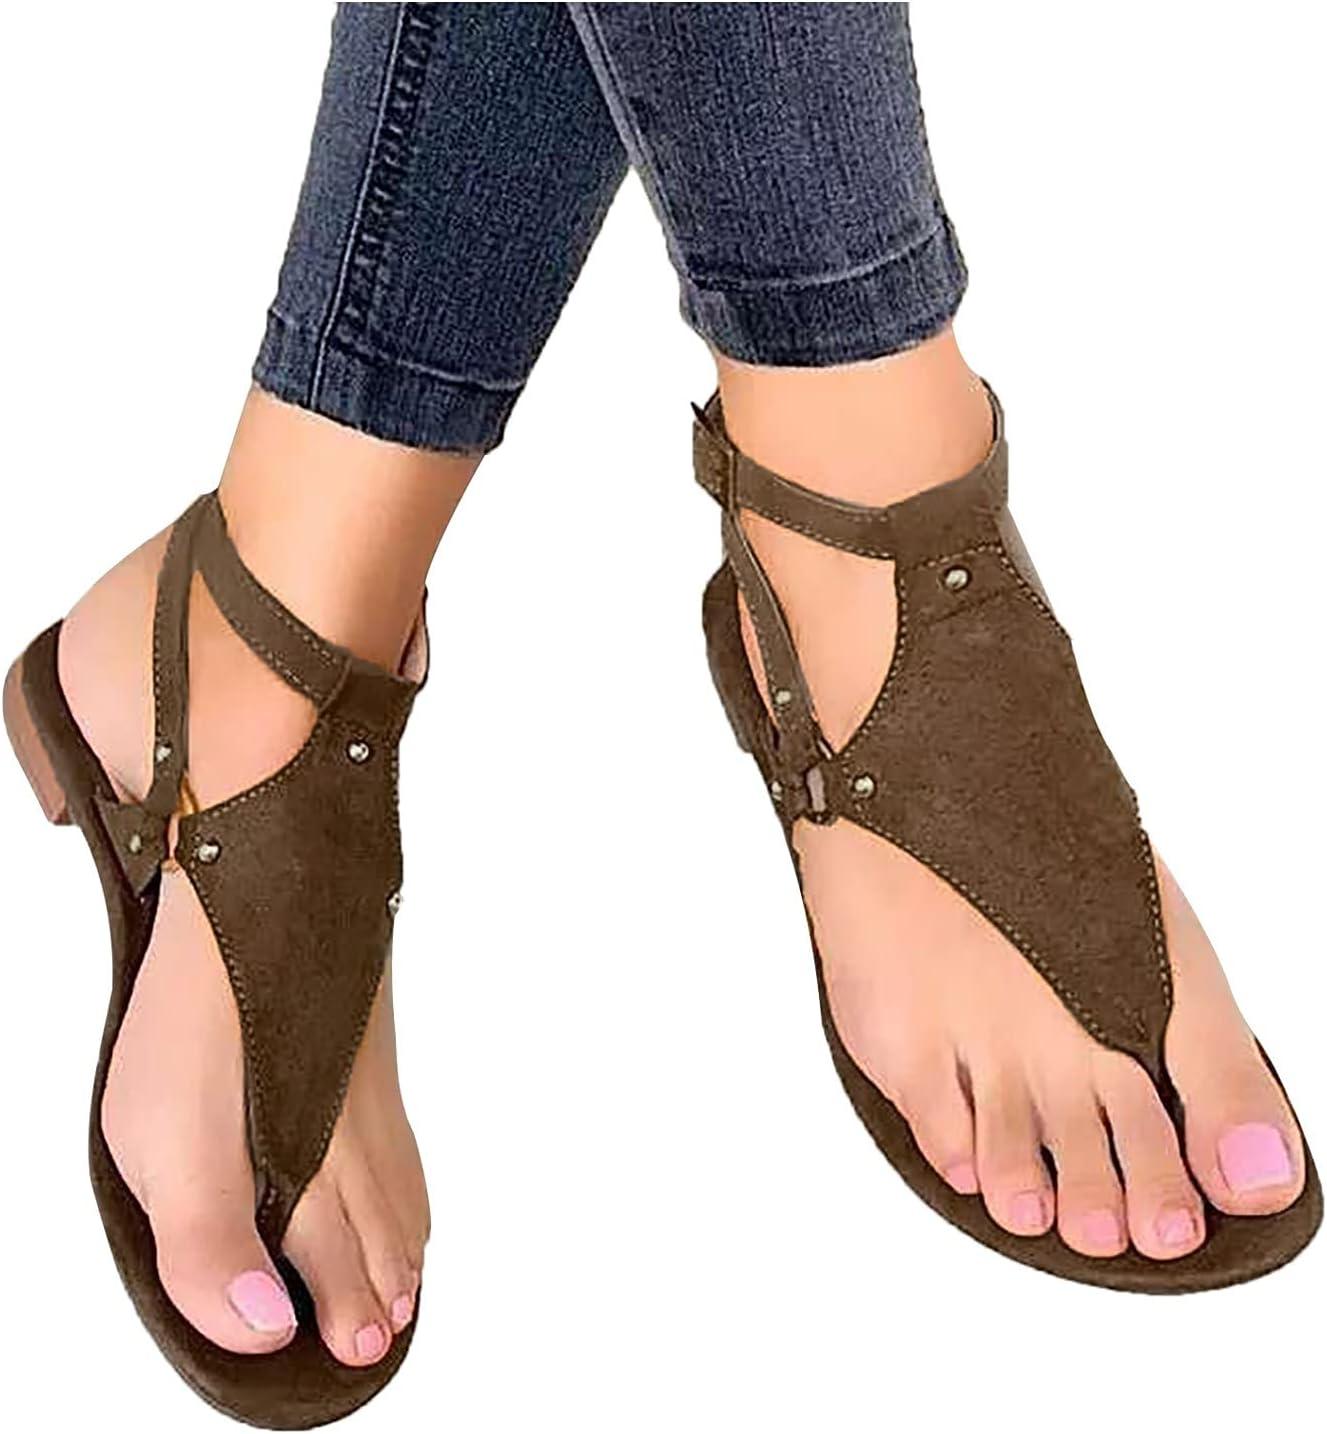 Sandals for Women Summer Bohemian Beach Flat Sandals Casual Comf